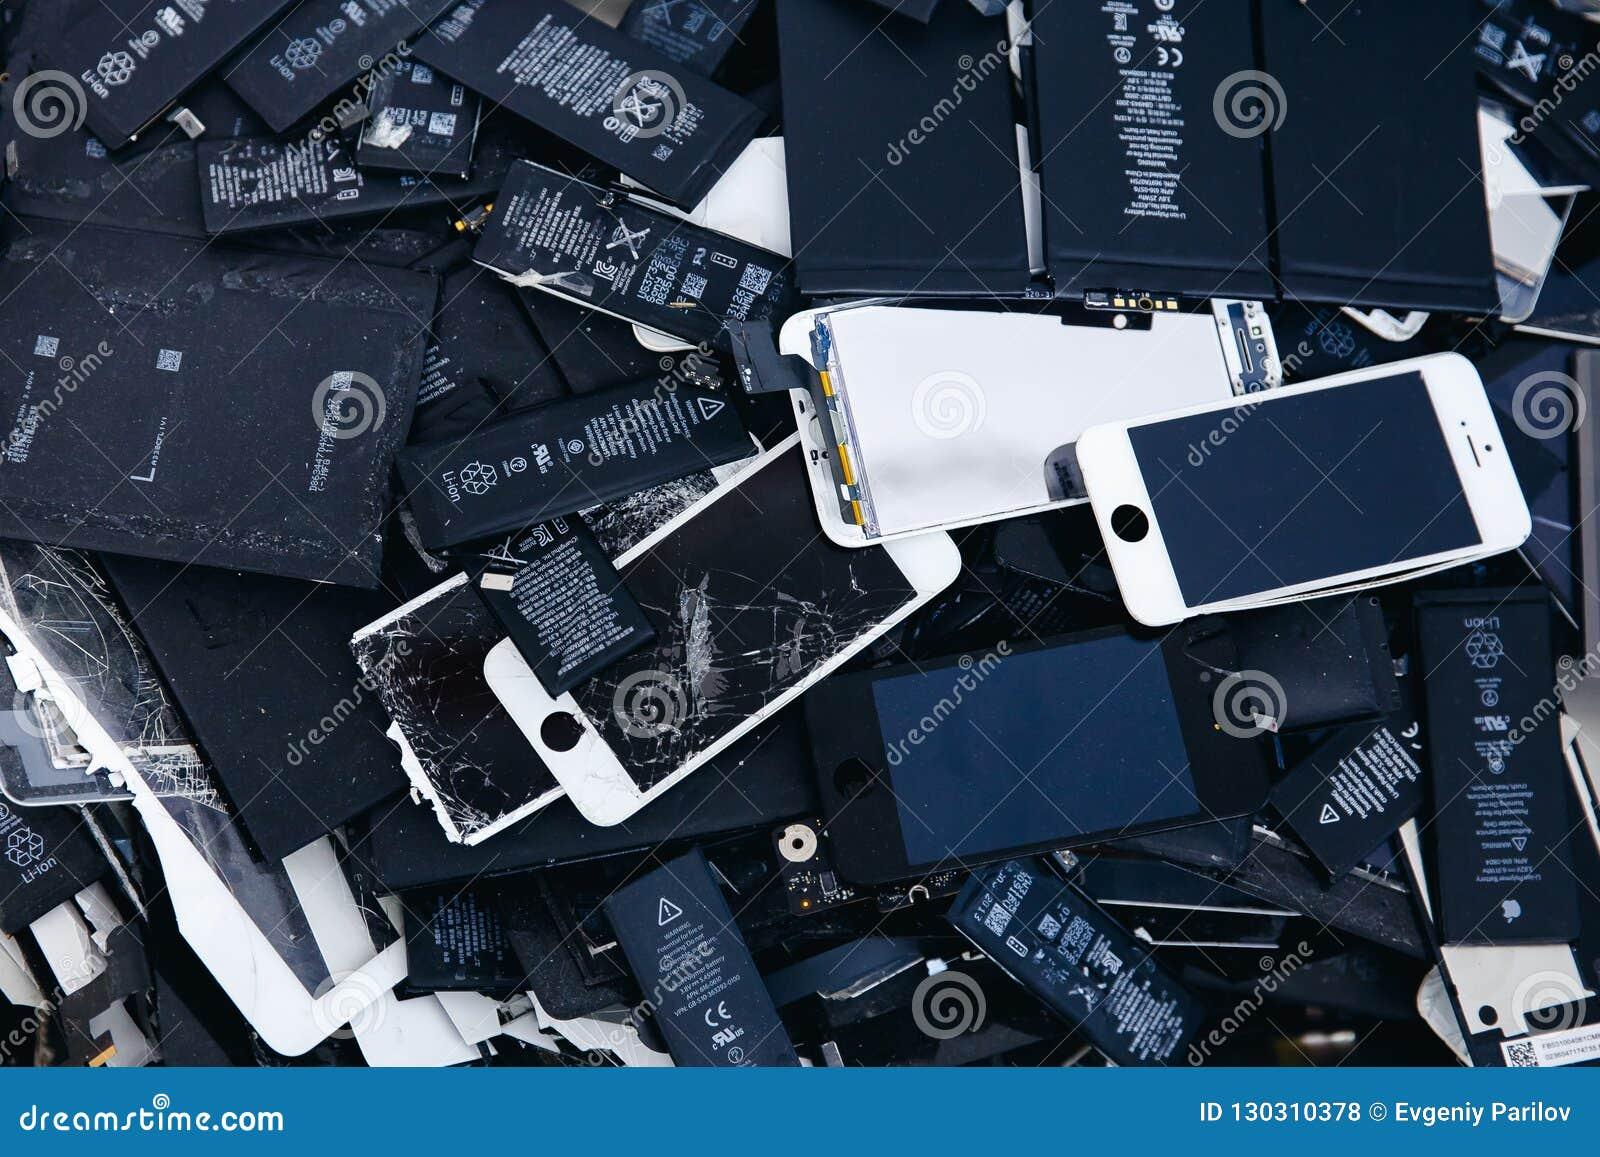 Mobile phone batteries, tablets, broken screens LCD iPhone